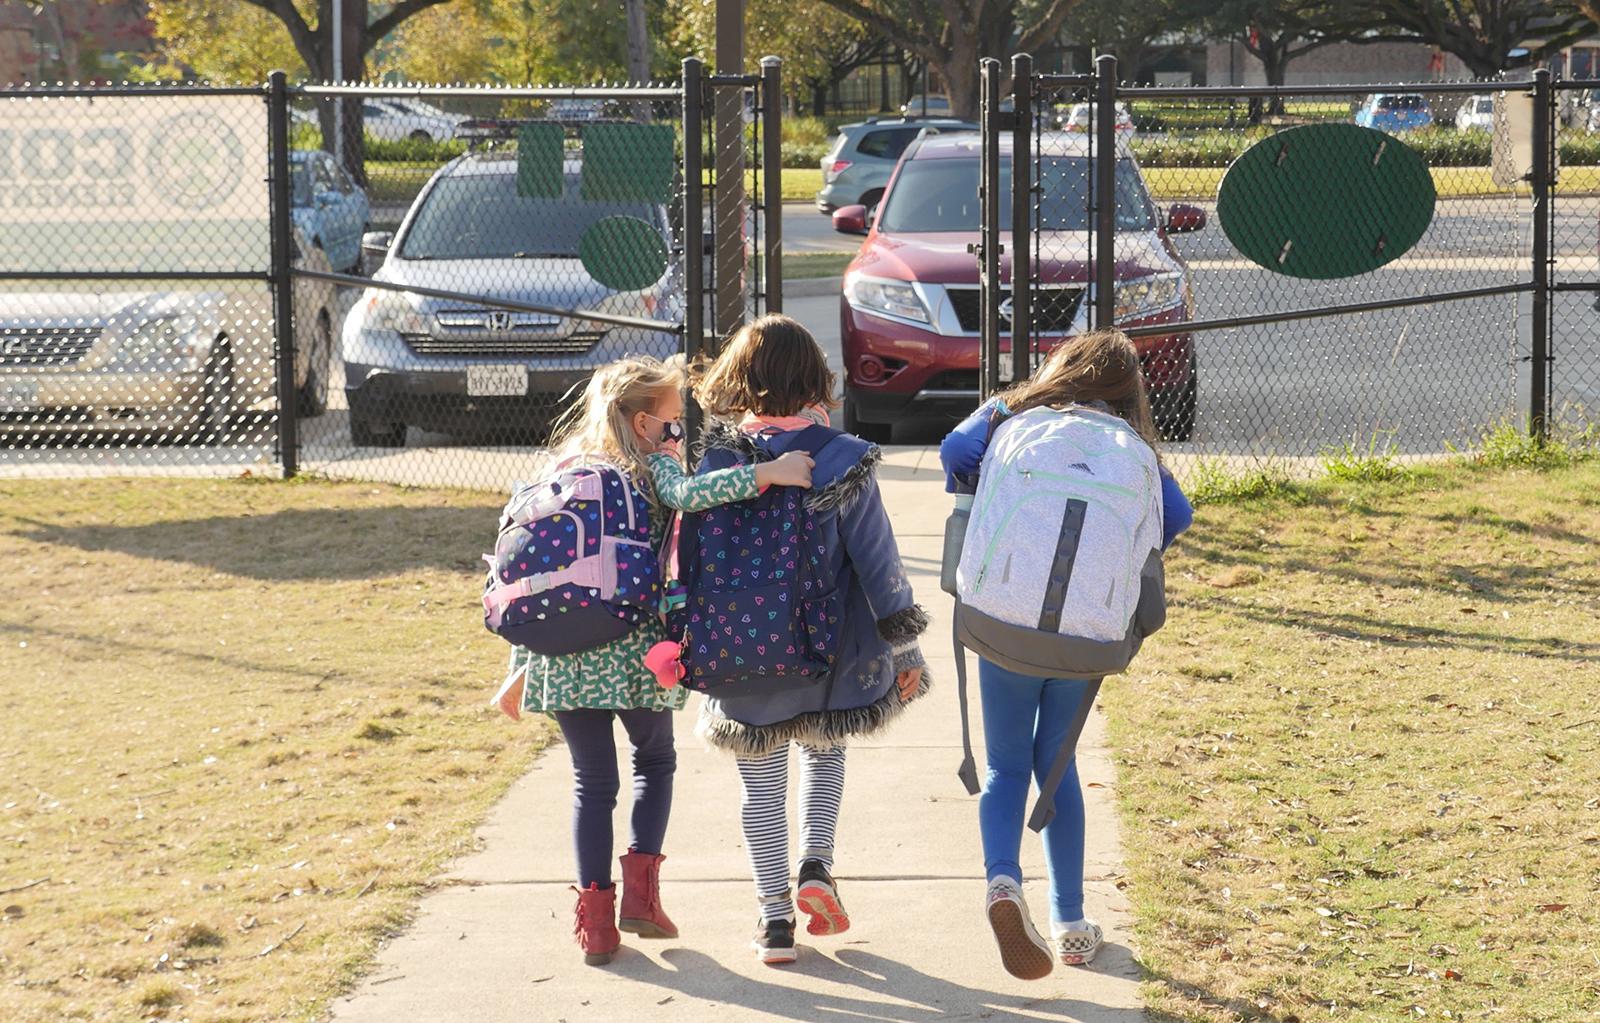 School children wearing facemasks walk outside Condit Elementary School in Bellaire, outside Houston, Texas, on December 16, 2020.